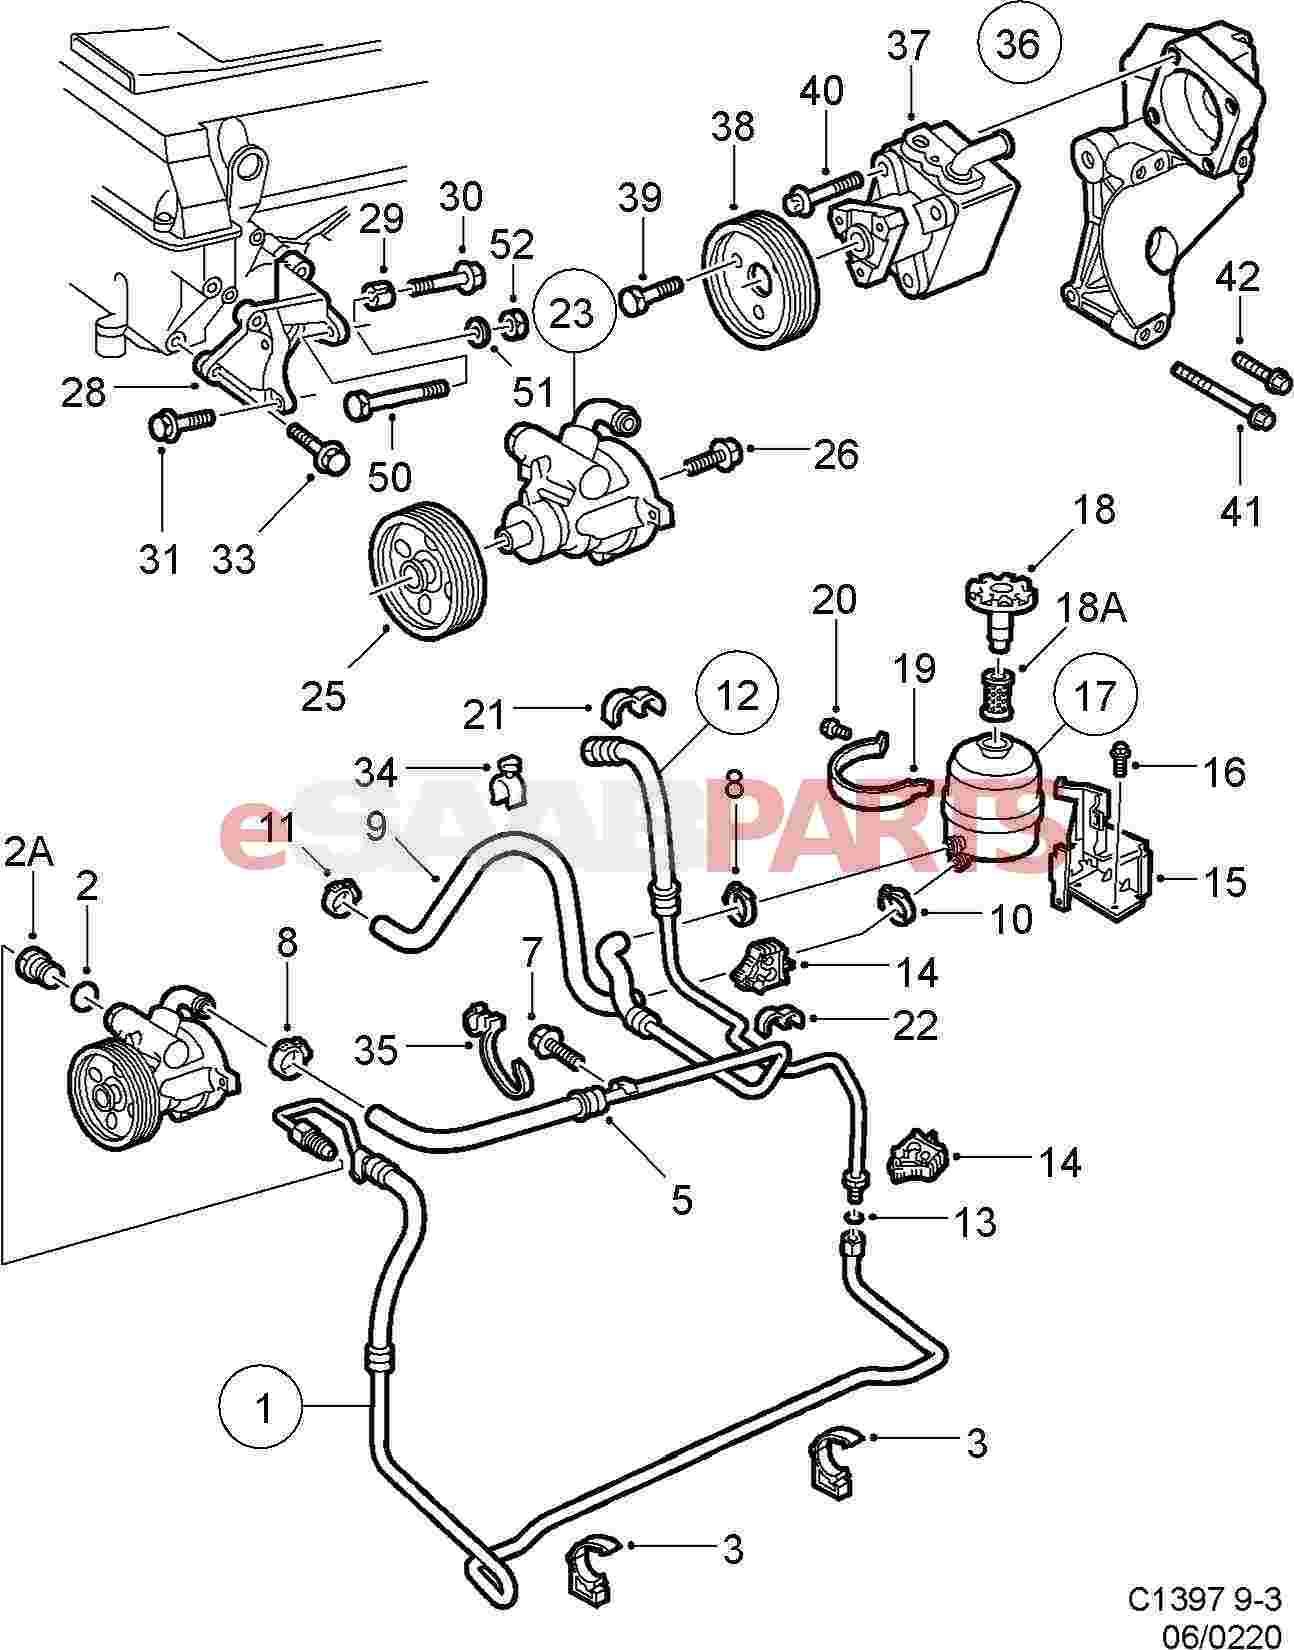 2008 saab 9 3 wiring diagram 1990 jeep wrangler radio parts  for free